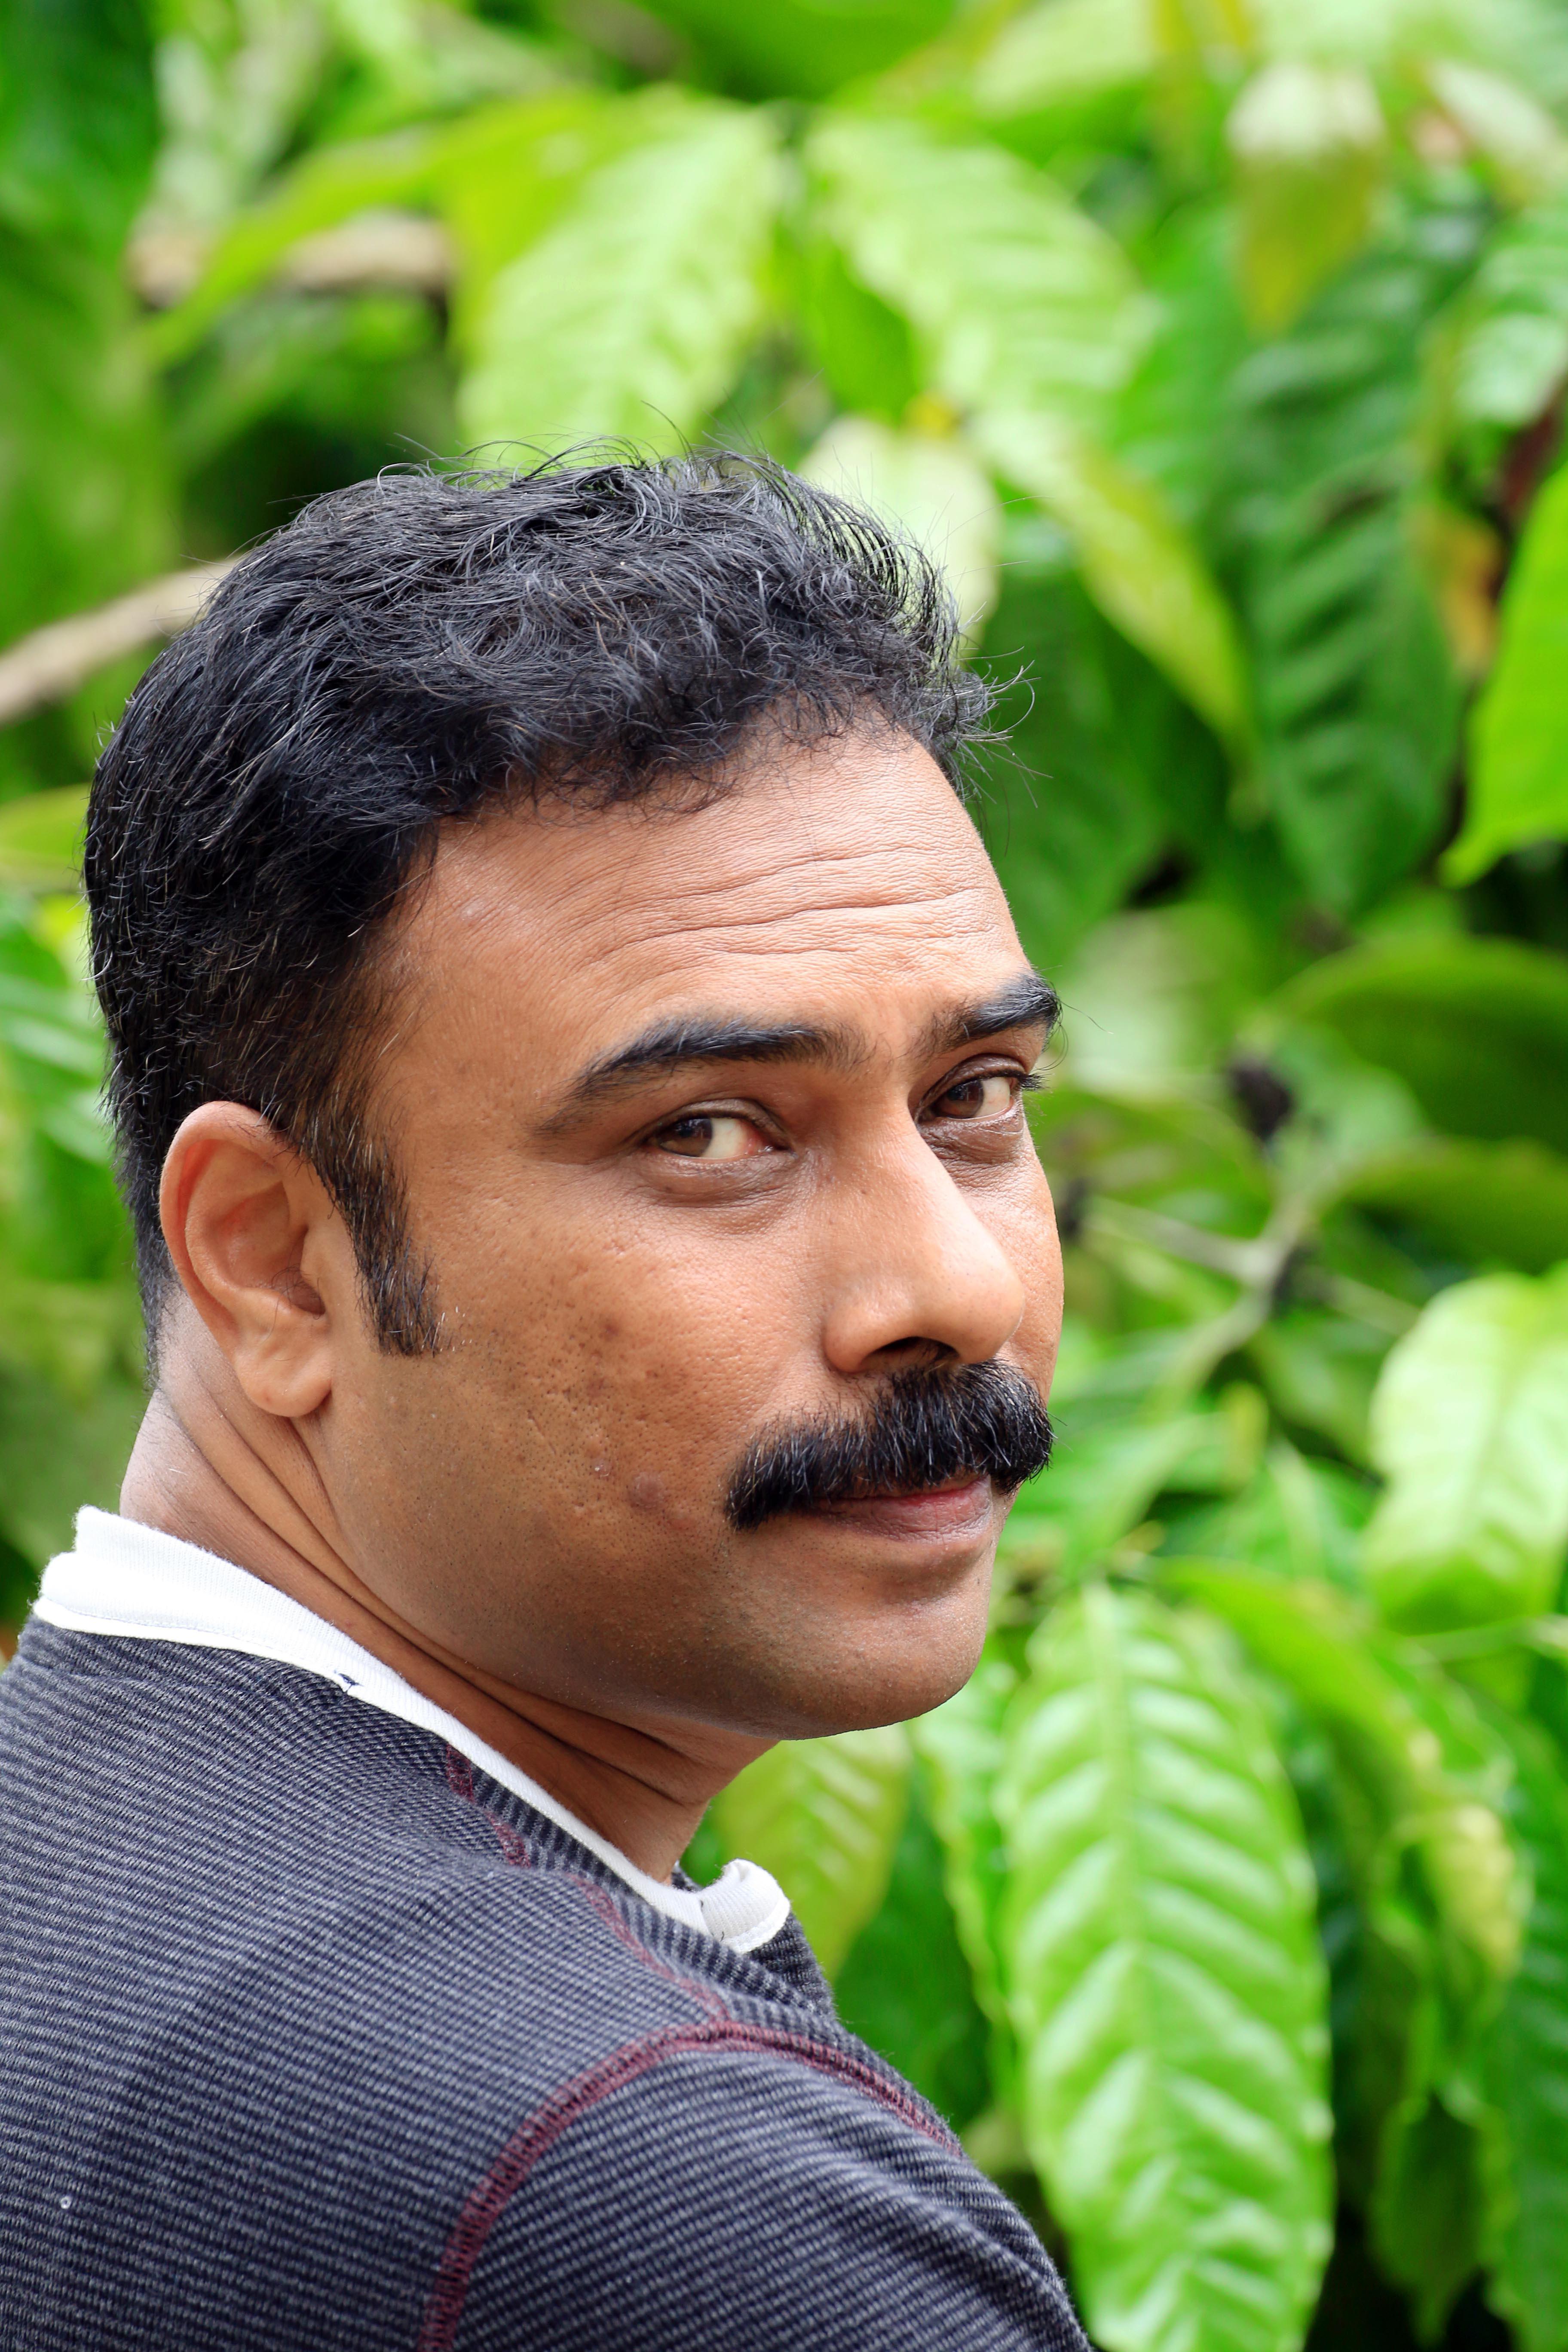 Rajesh mallarkandy